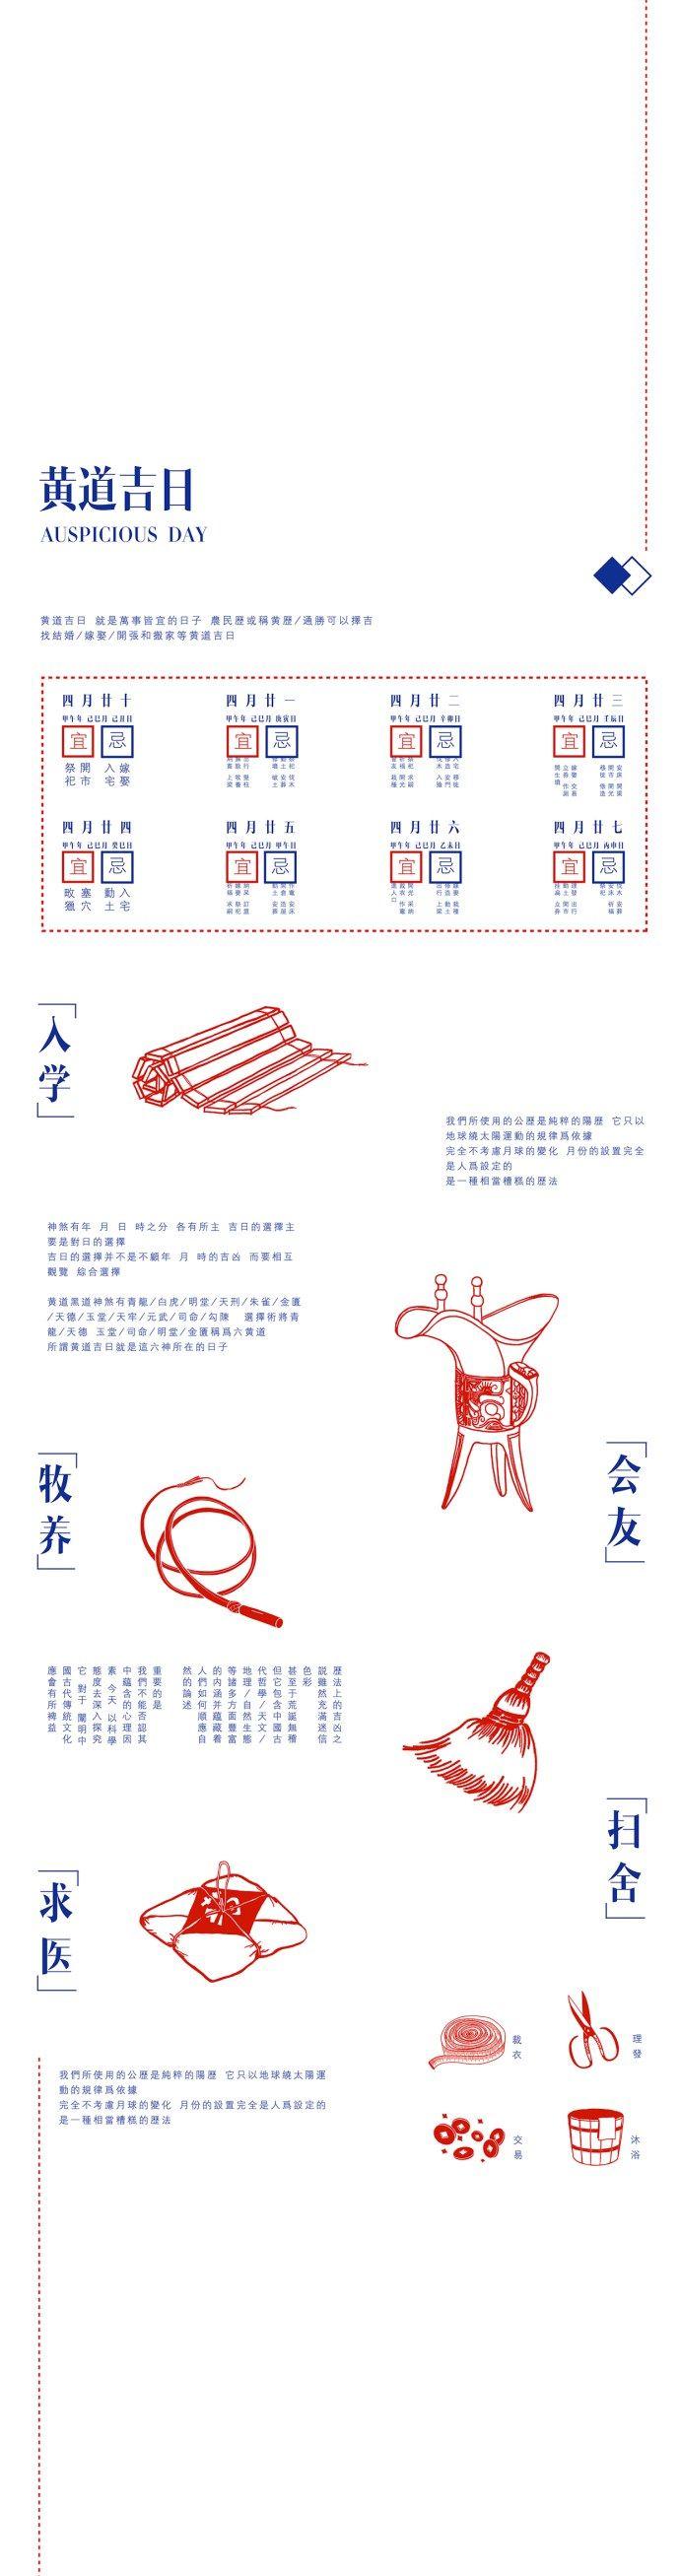 Designed by Chris Chu | Behance